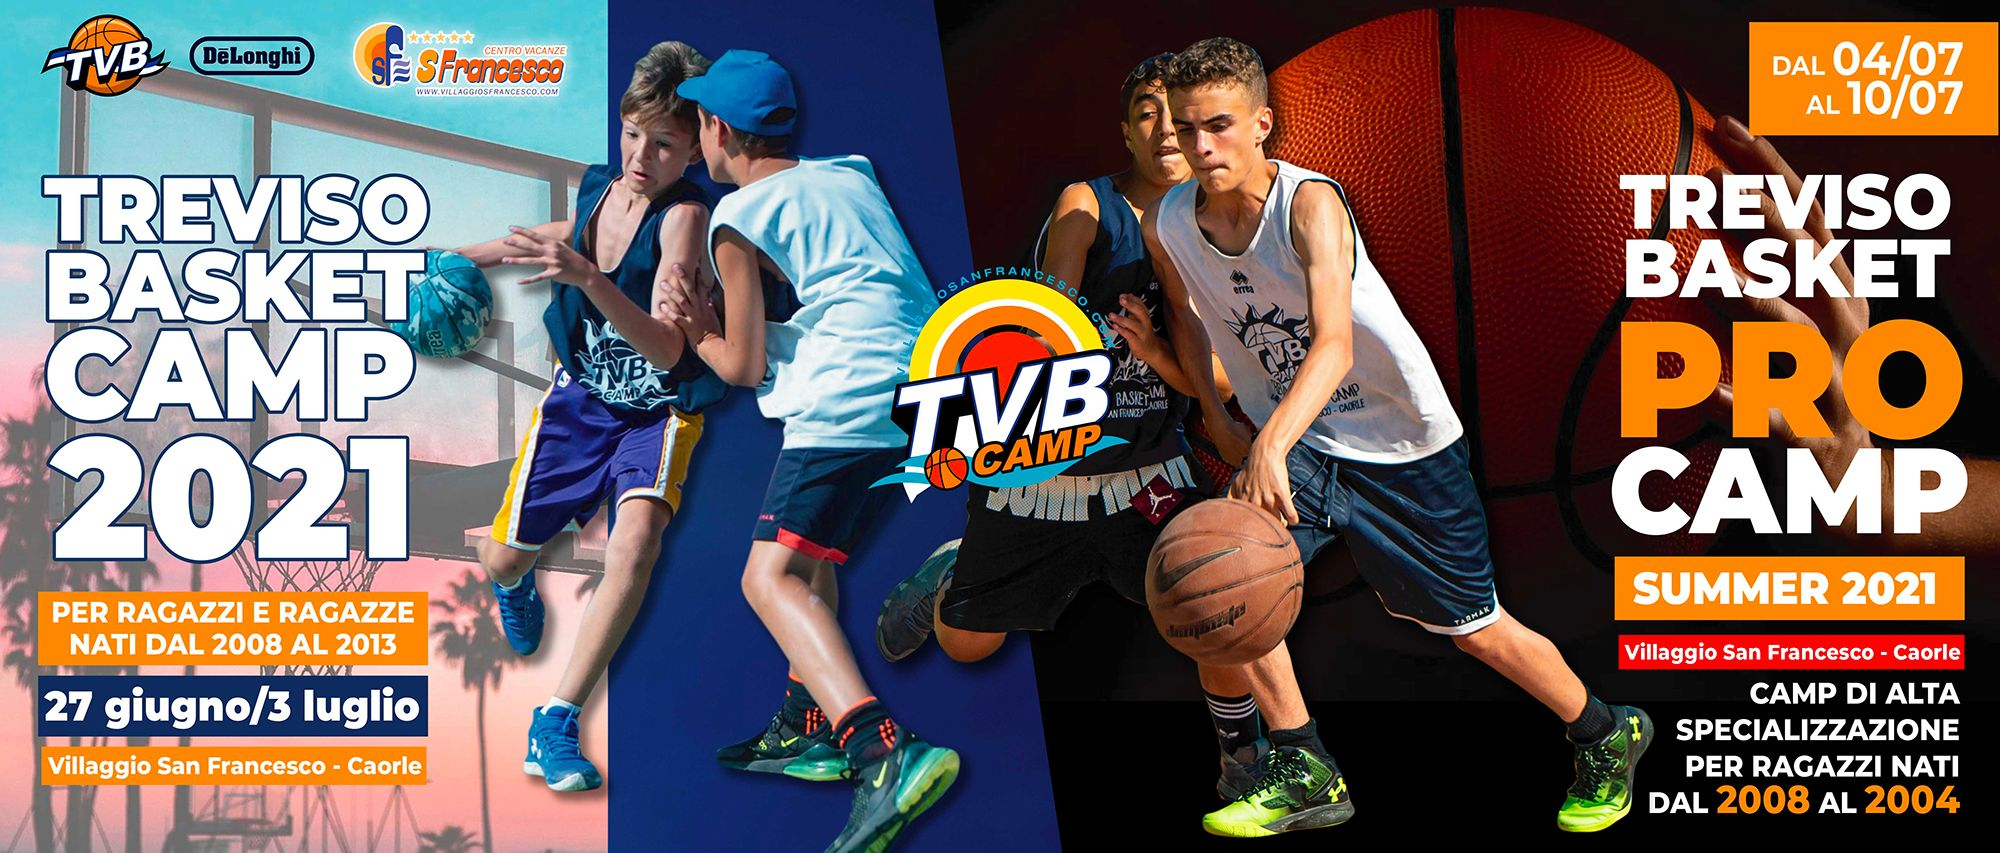 TVB Camp e TVB PRO Camp 2021